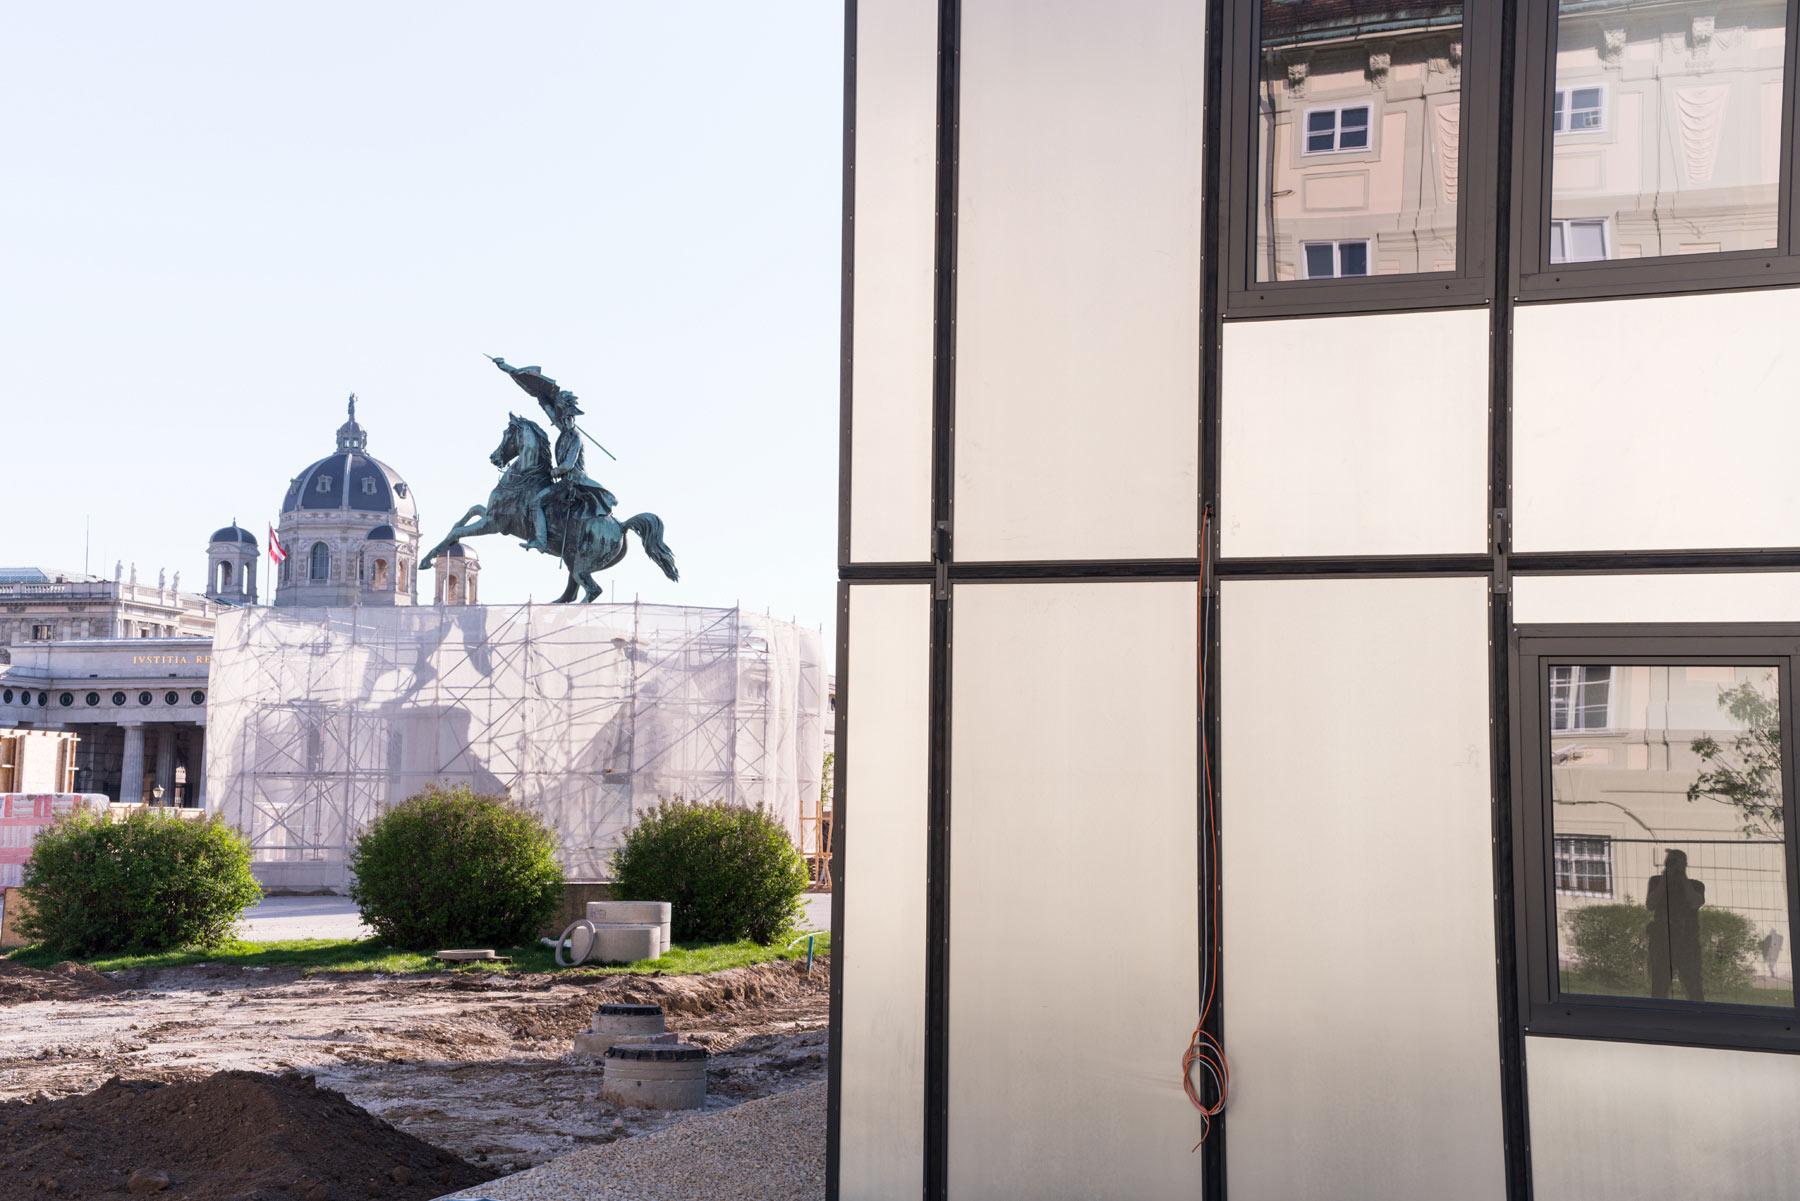 Vienna-statue-buildings.jpg